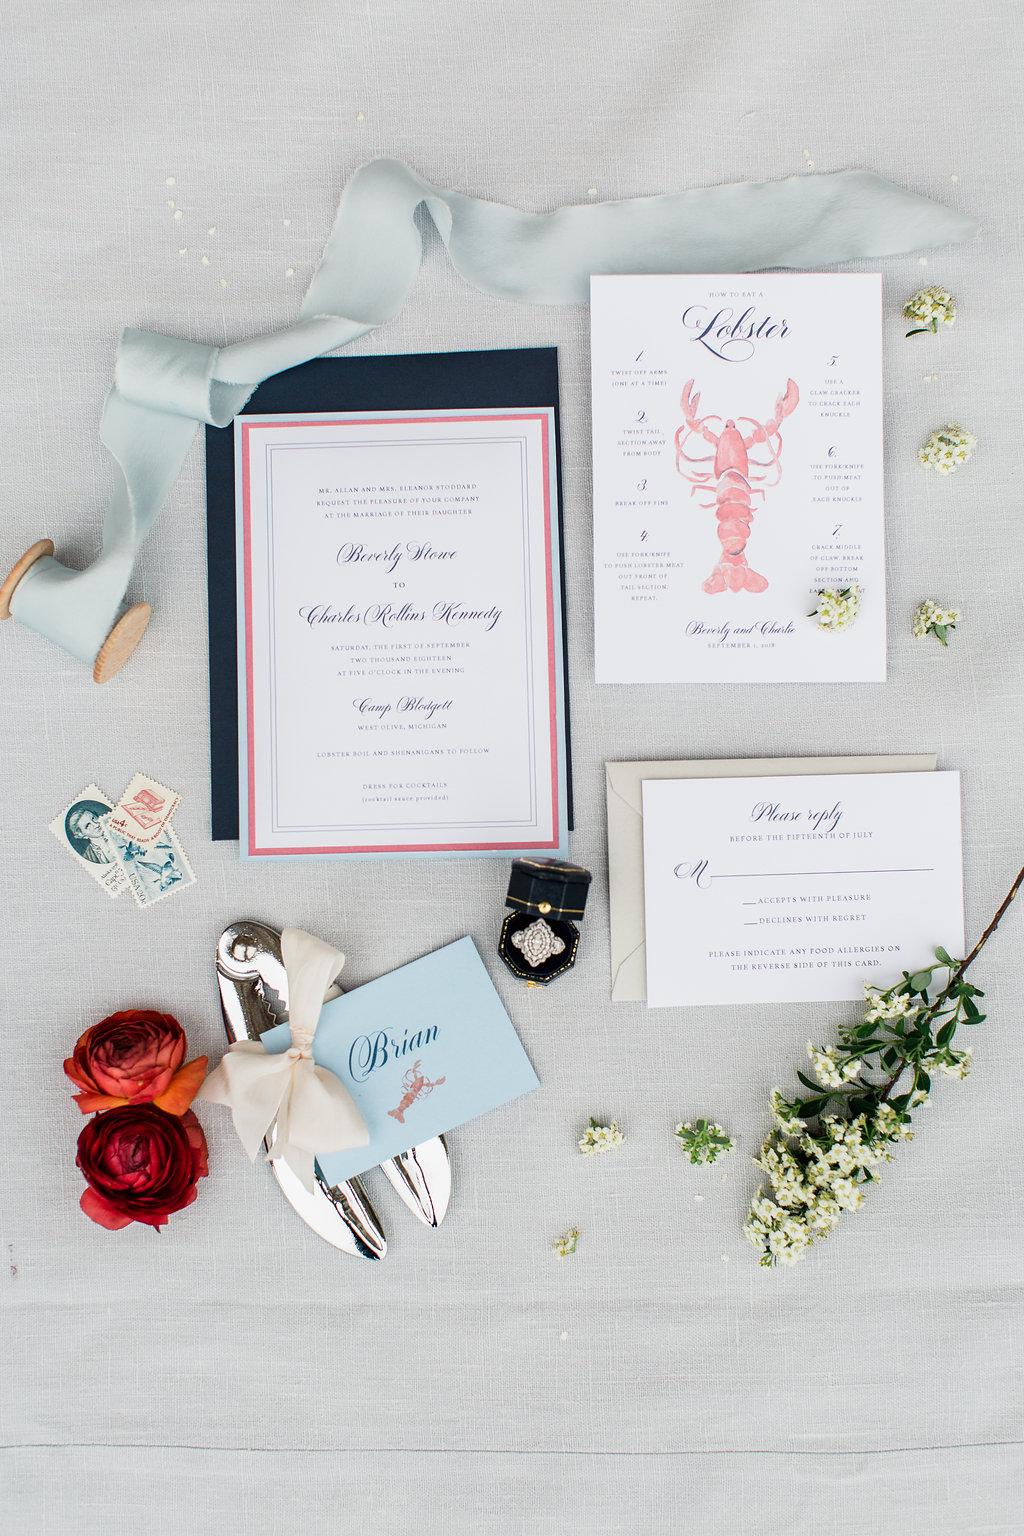 Lobster invitation suite